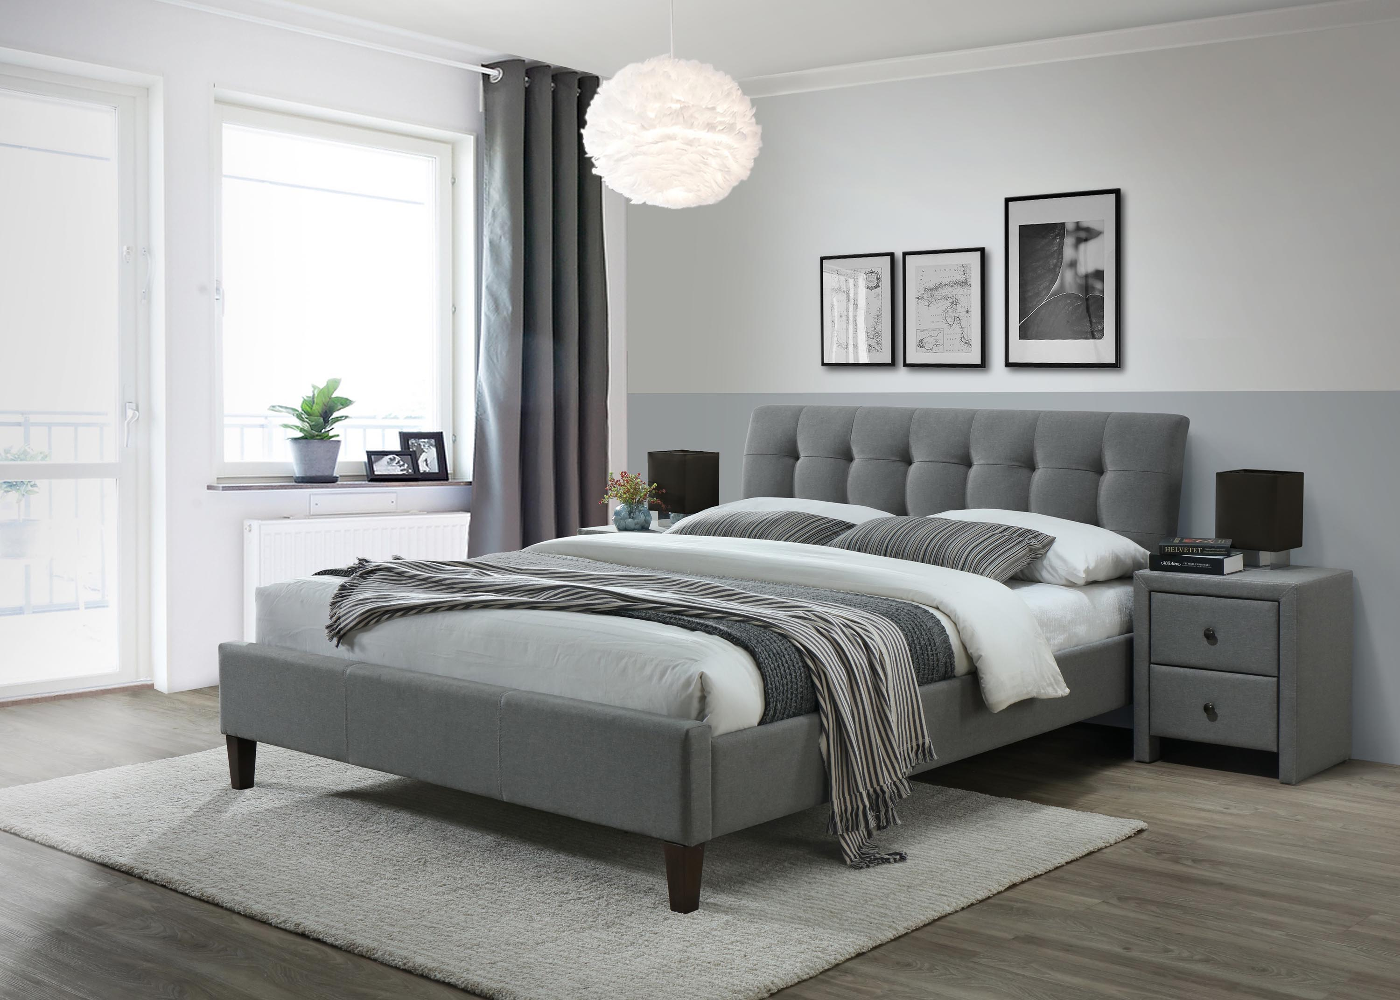 SAMARA 2 160 łóżko tkanina popiel (2p=1szt.)